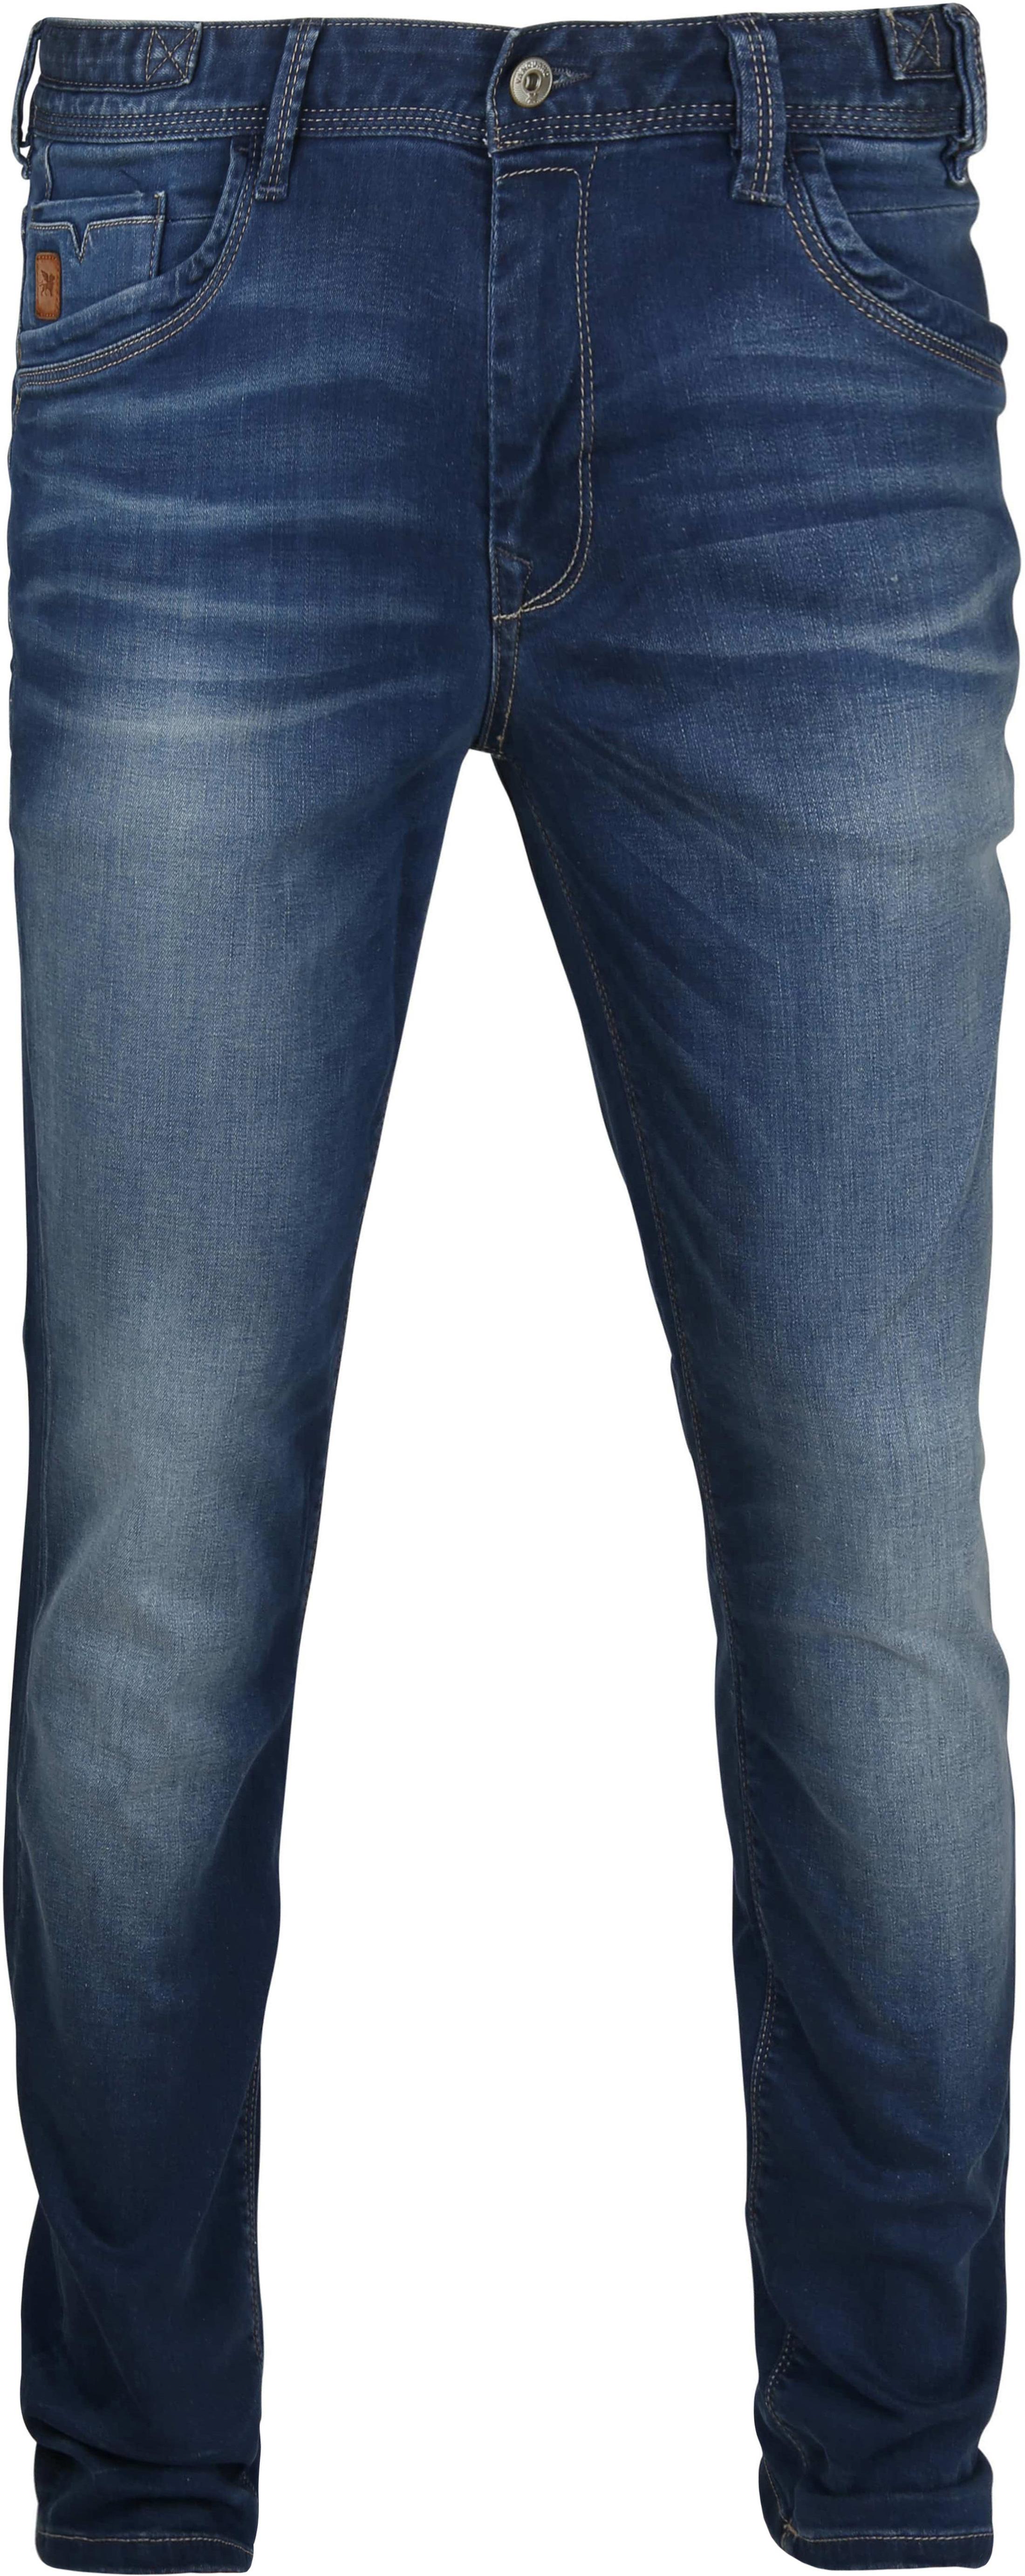 Vanguard V8 Racer Blau Jeans